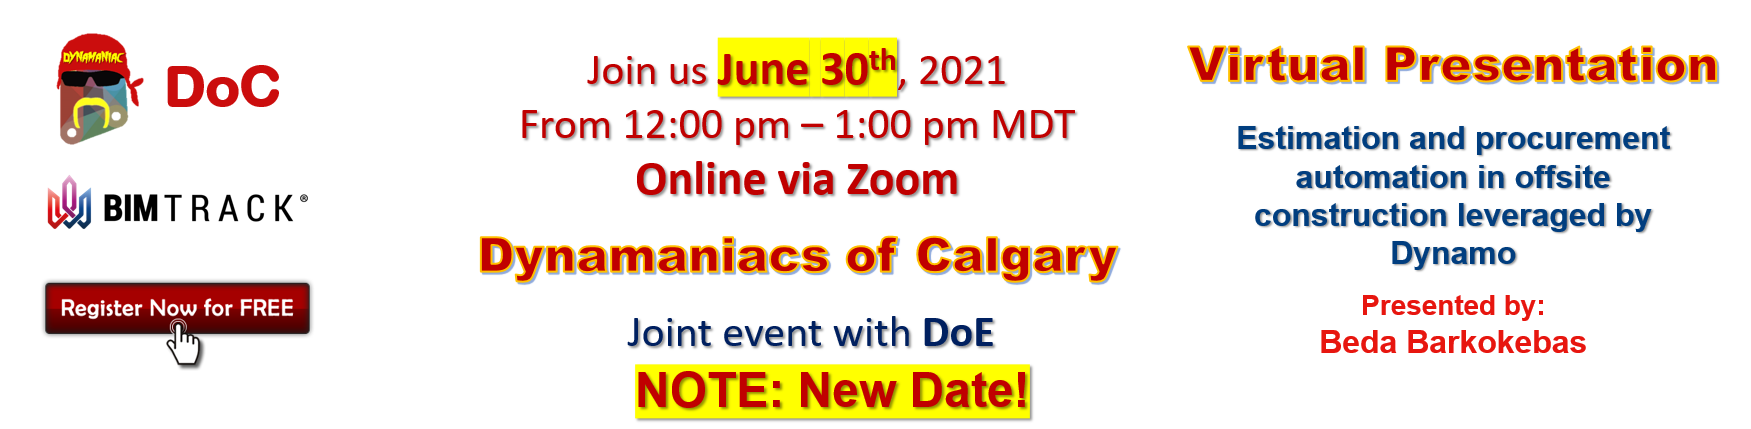 DoC_E11_Banner_Small_New Date